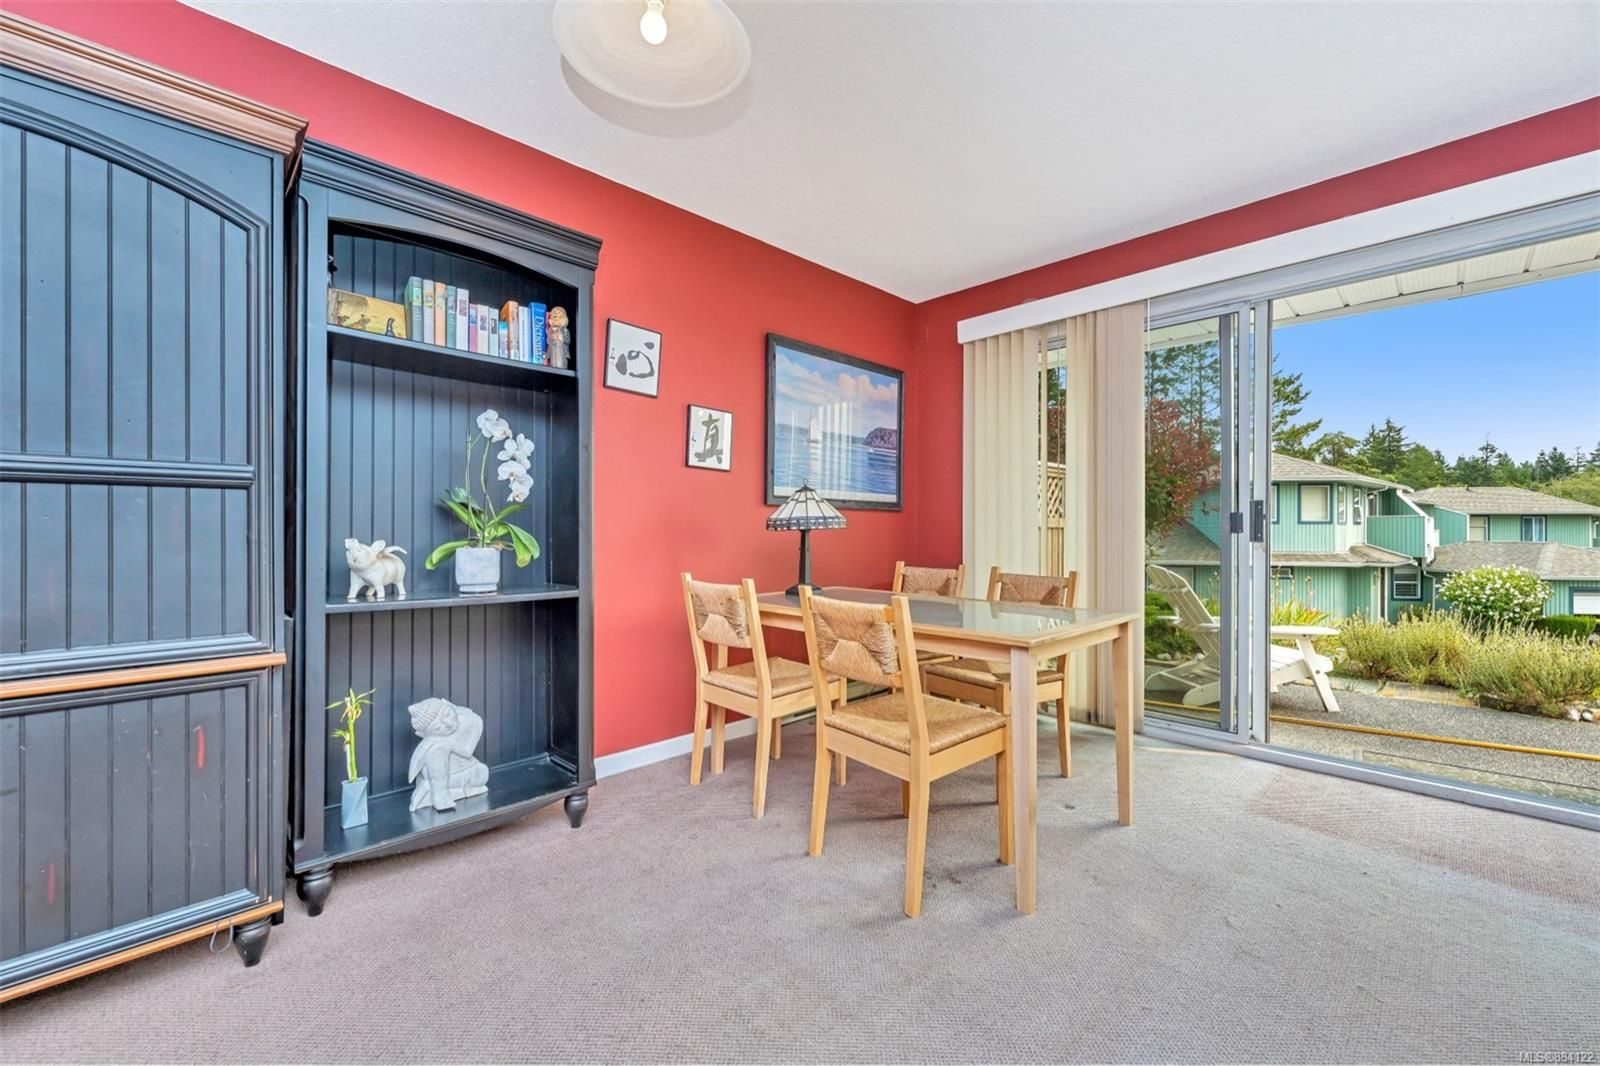 Main Photo: 4 130 Corbett Rd in : GI Salt Spring Row/Townhouse for sale (Gulf Islands)  : MLS®# 884122